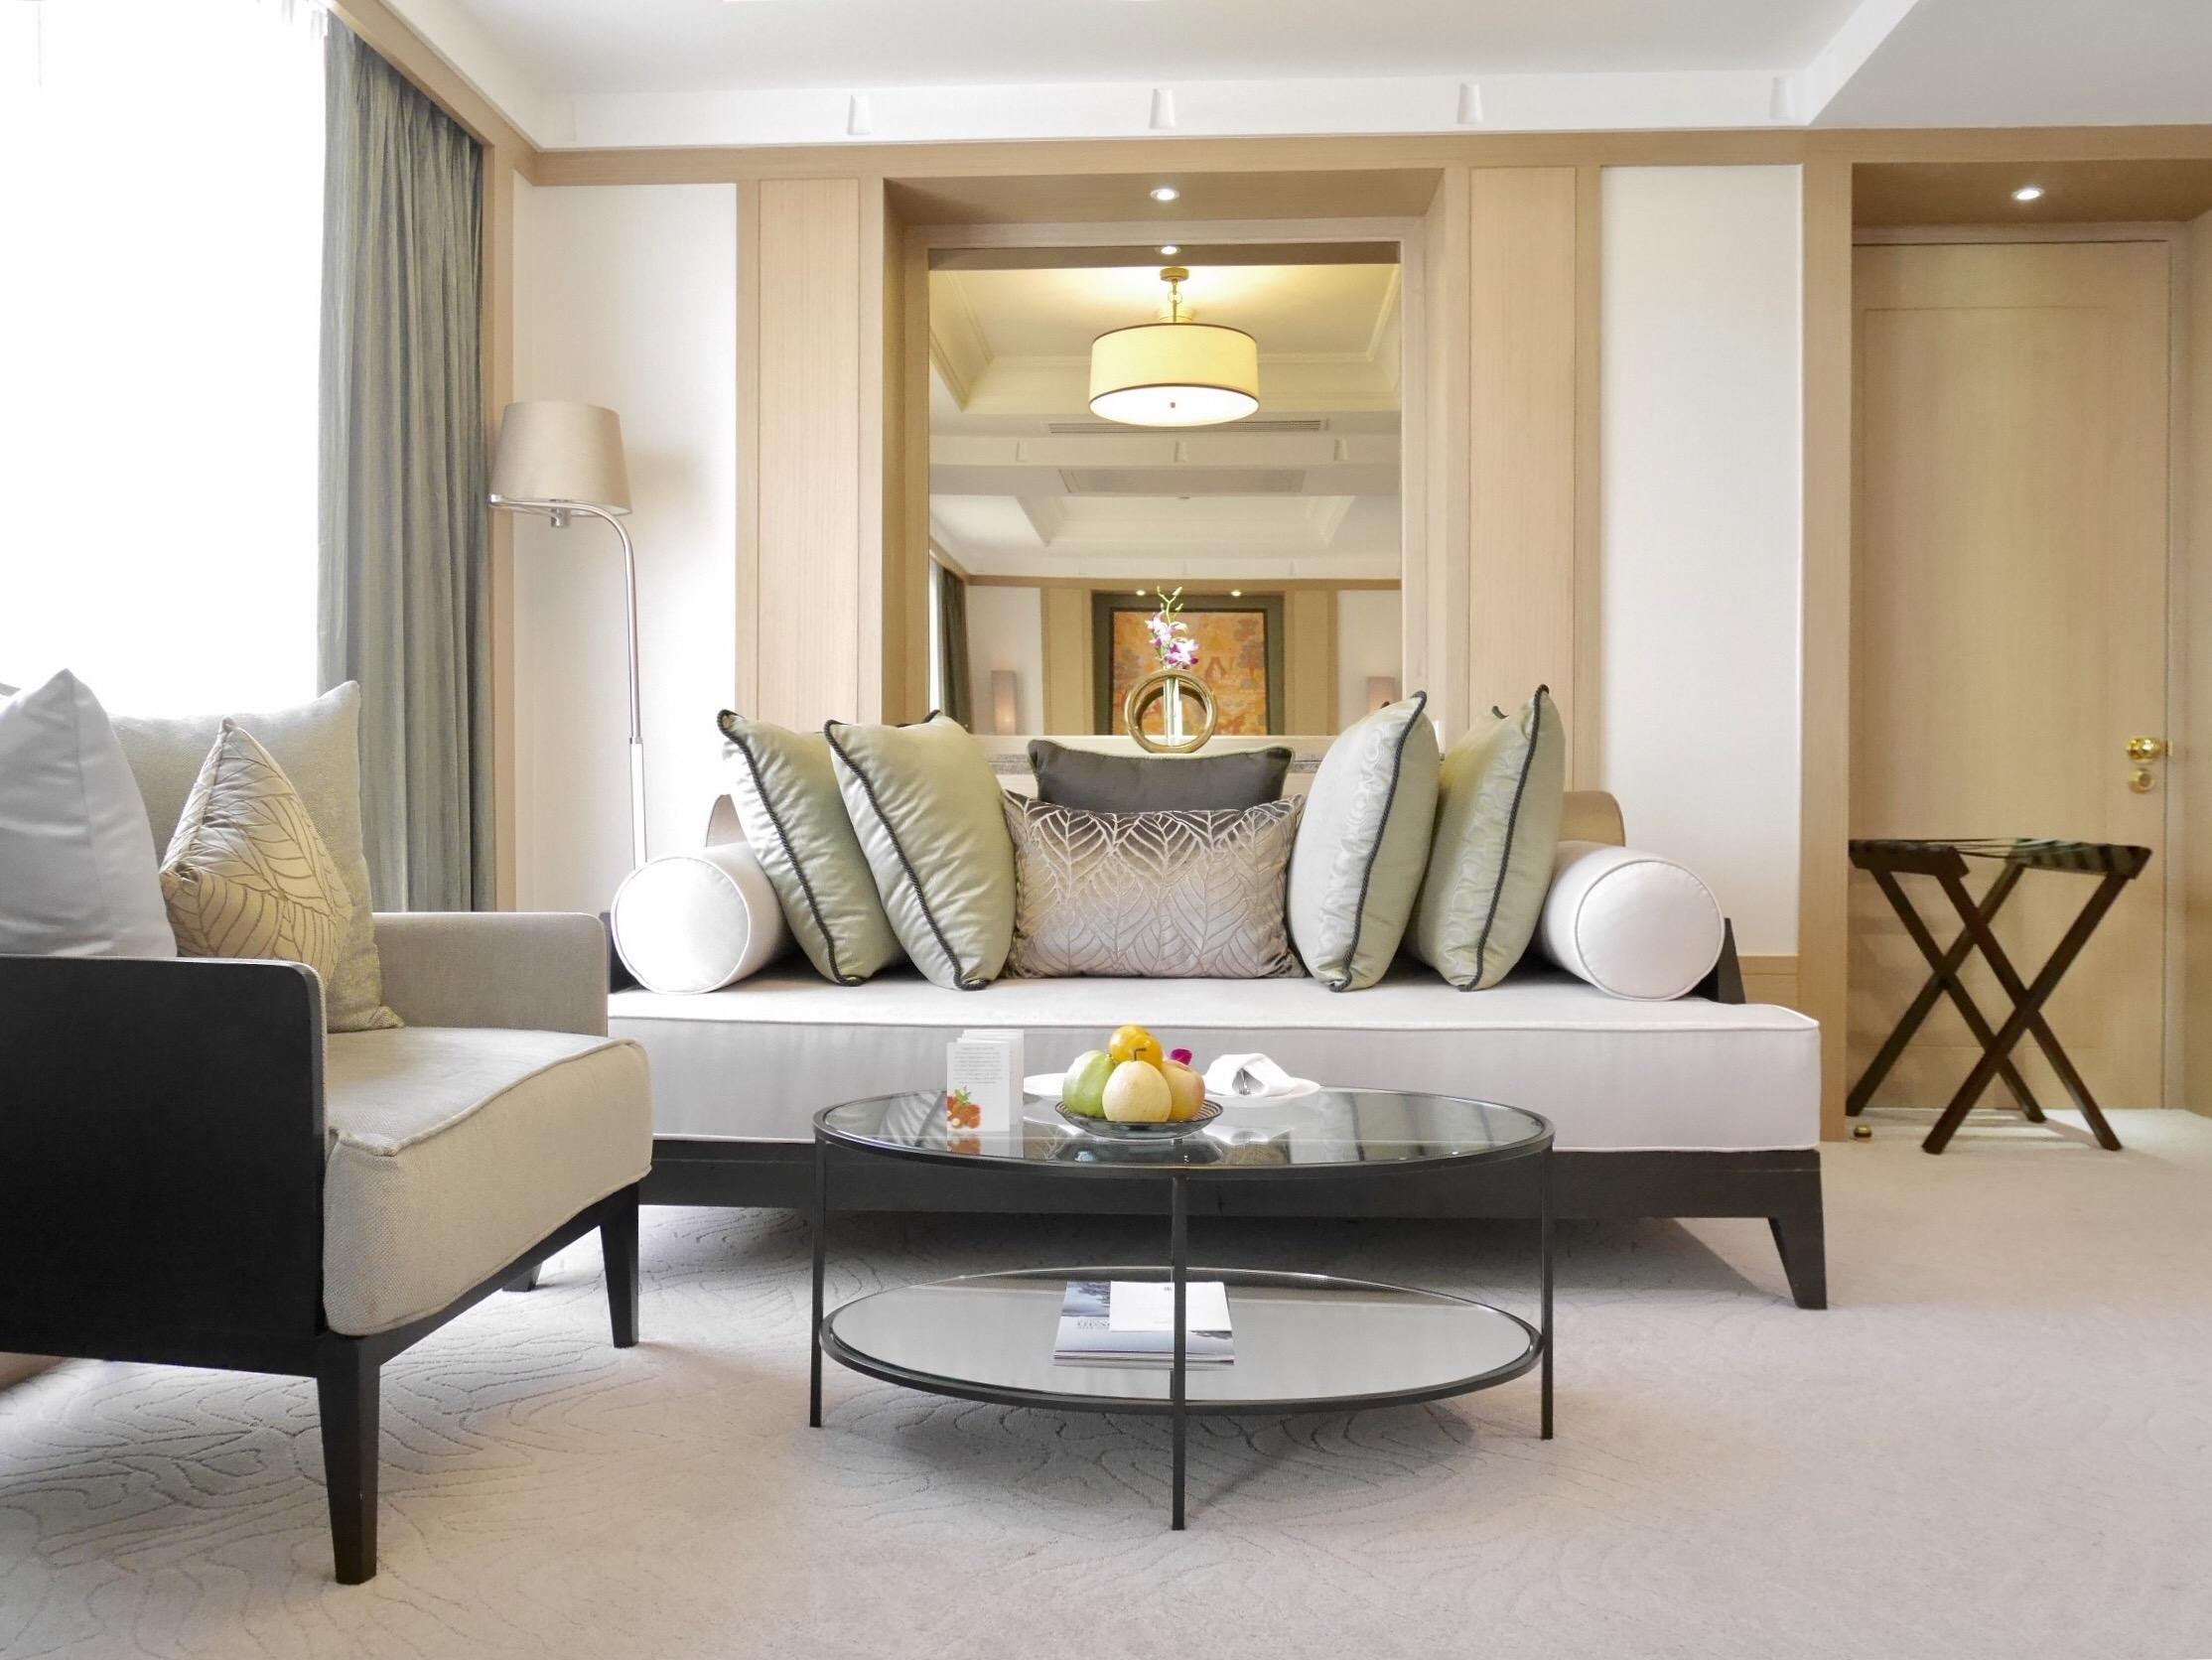 img 8206 - Banyan Tree Bangkok - 五つ星ホテルバンヤンツリーのSERENITY CLUBで過ごすリュクスな時間 「客室編」